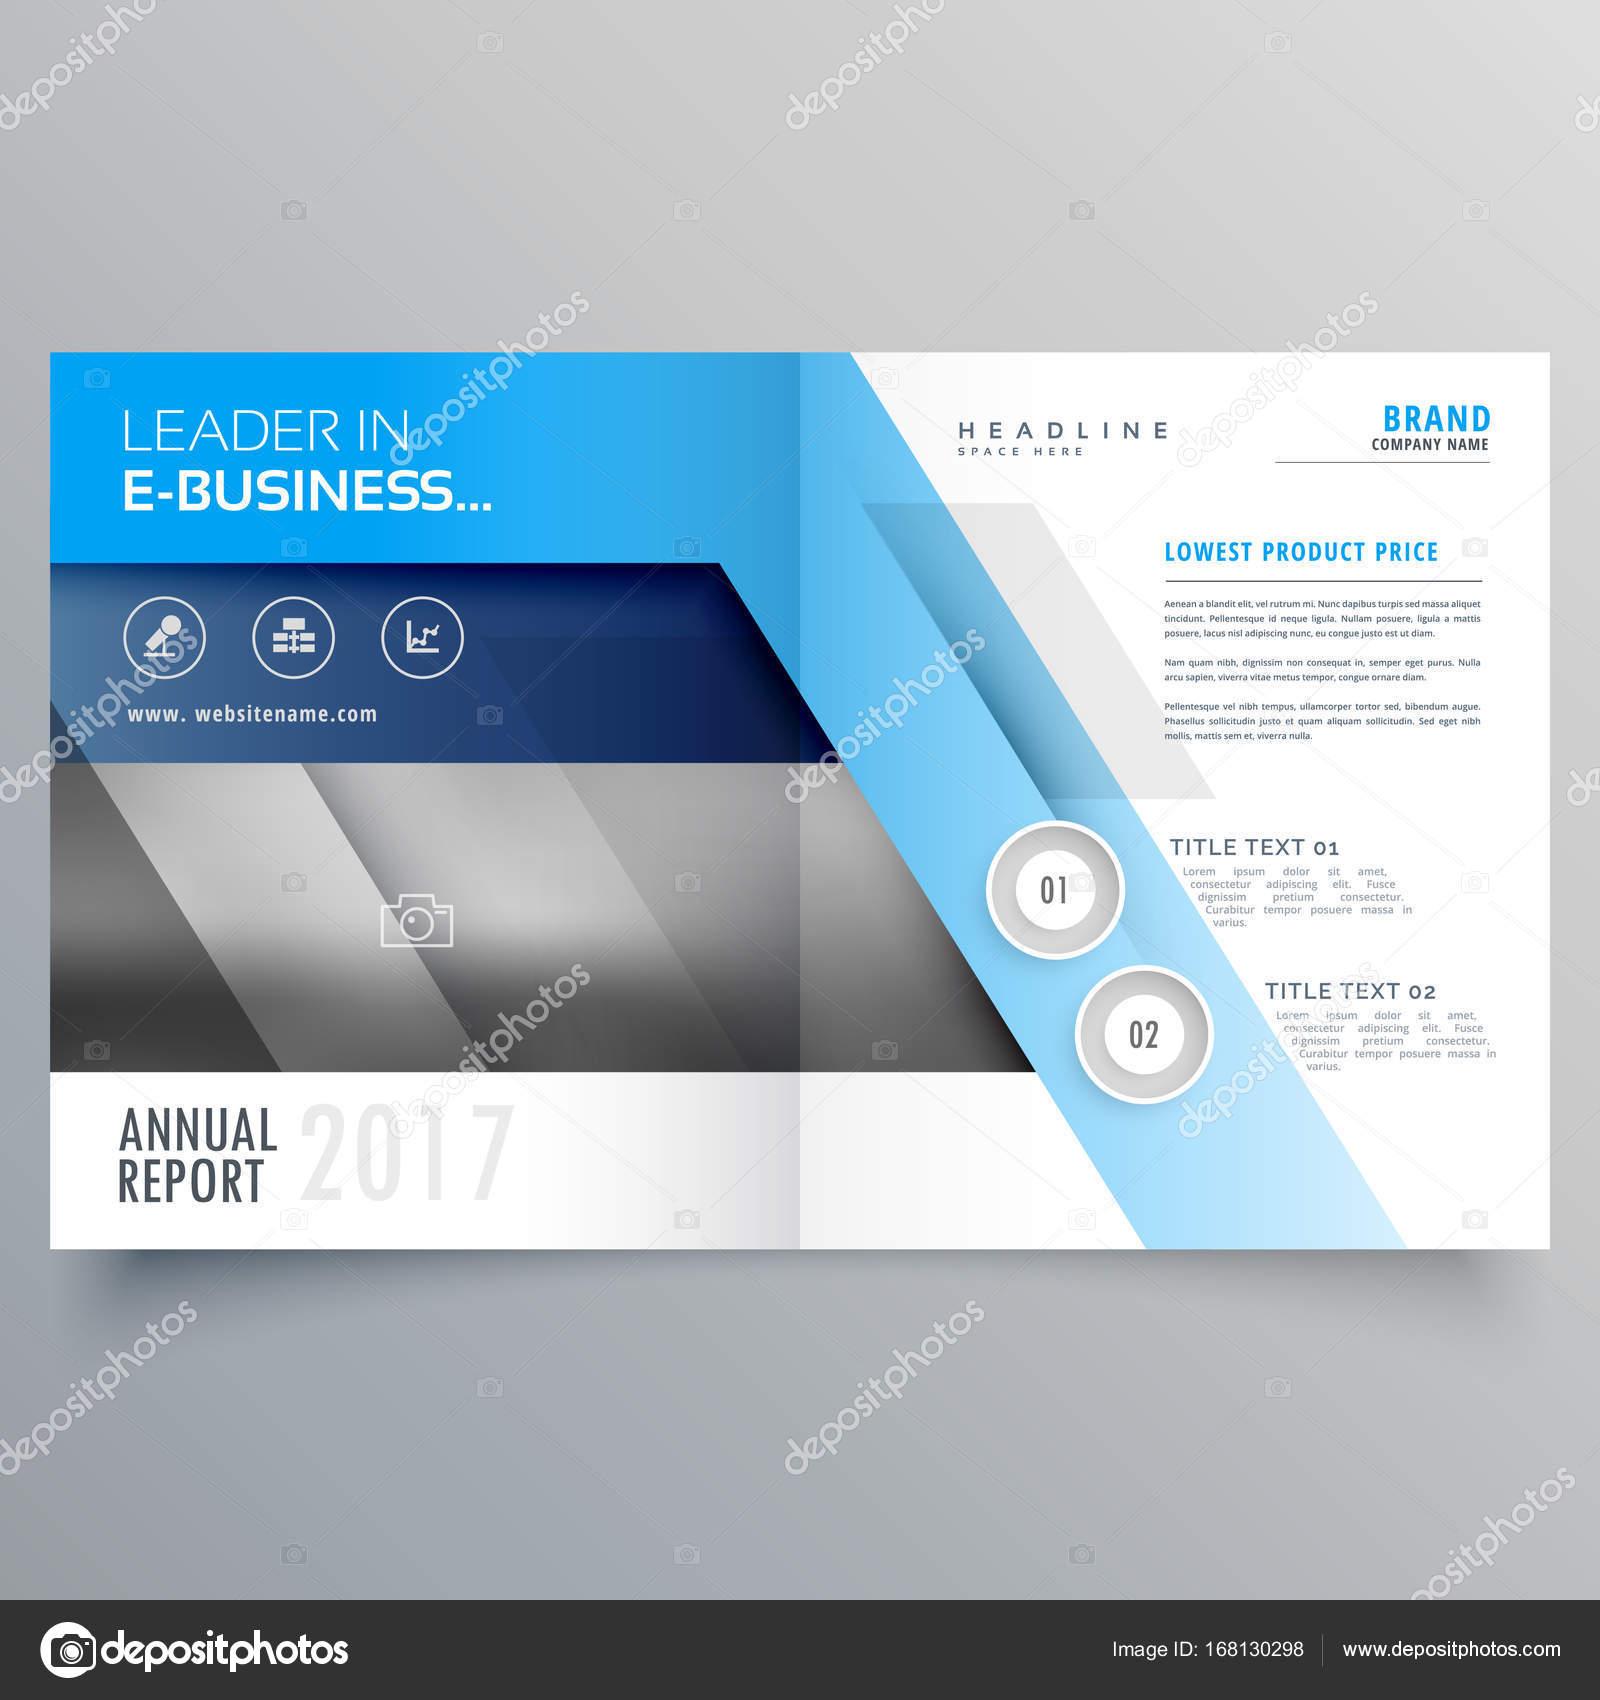 Science Magazine Cover Page Design Professional Magazine Cover Page Design Or Bi Fold Brochure Temp Stock Vector C Starline 168130298